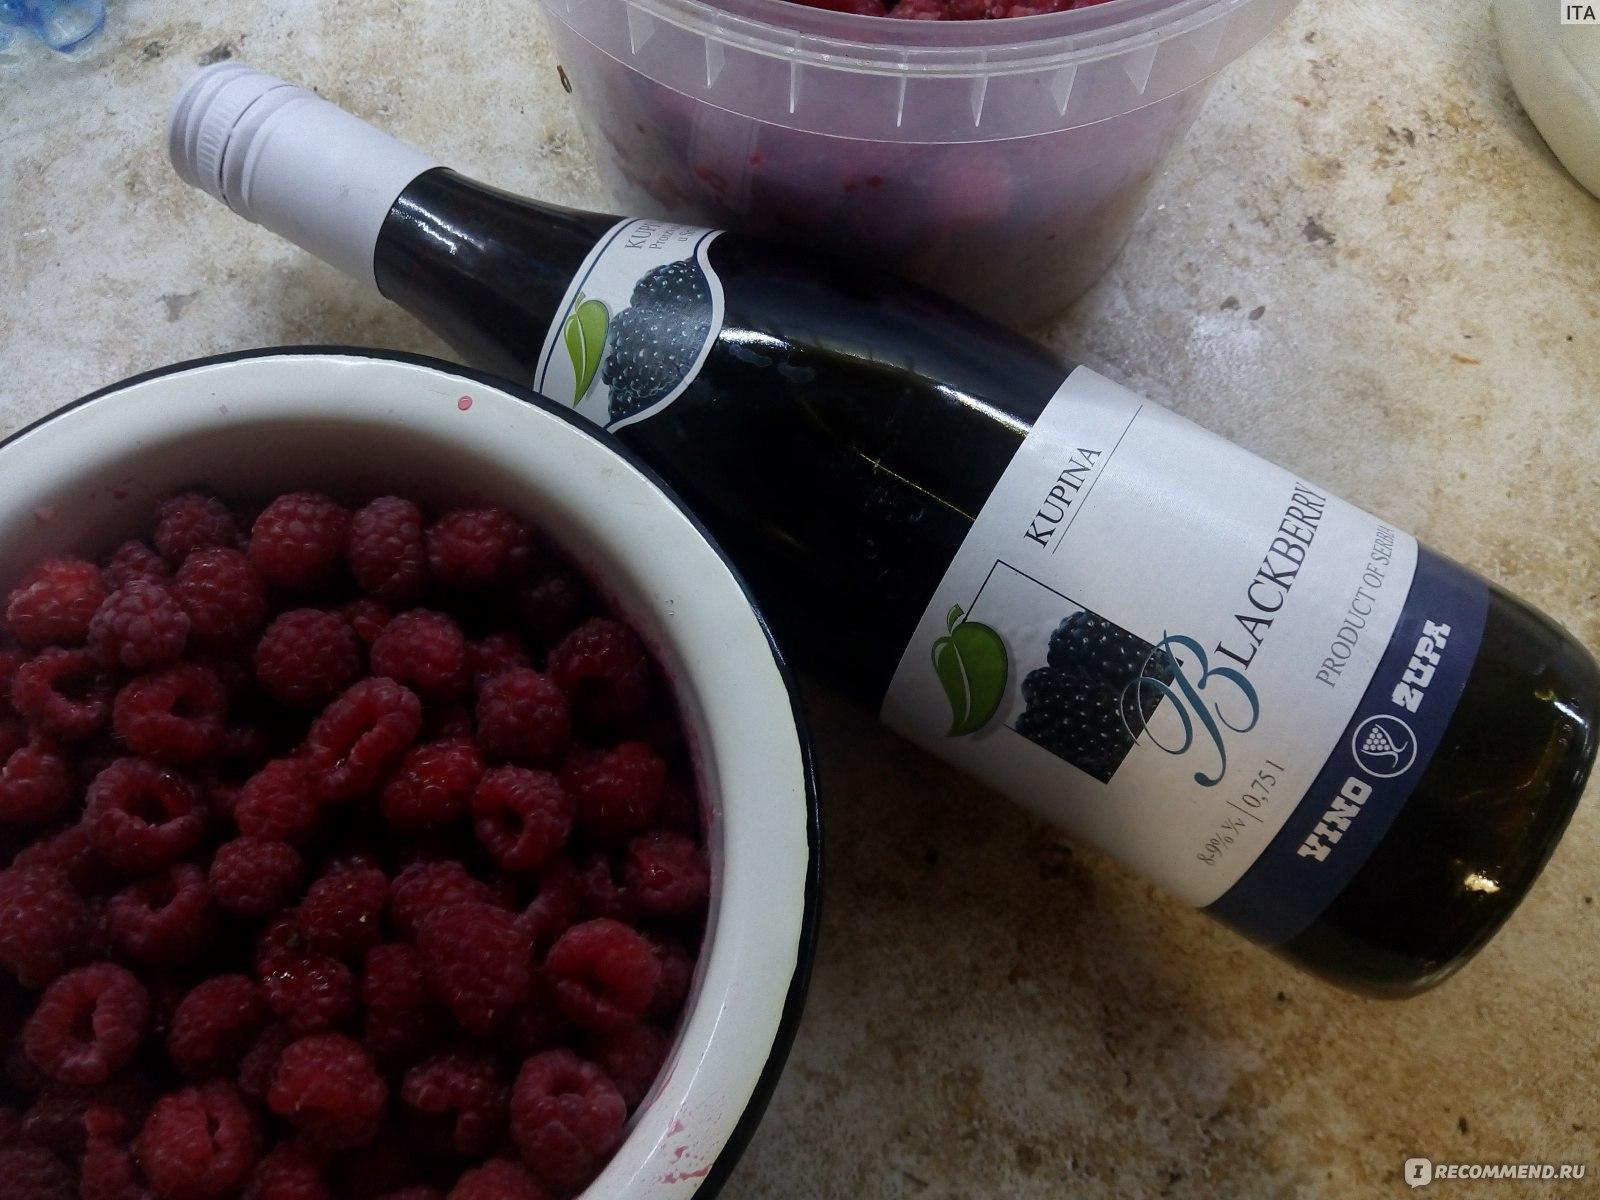 Рецепты вино из ежевики в домашних условиях 59